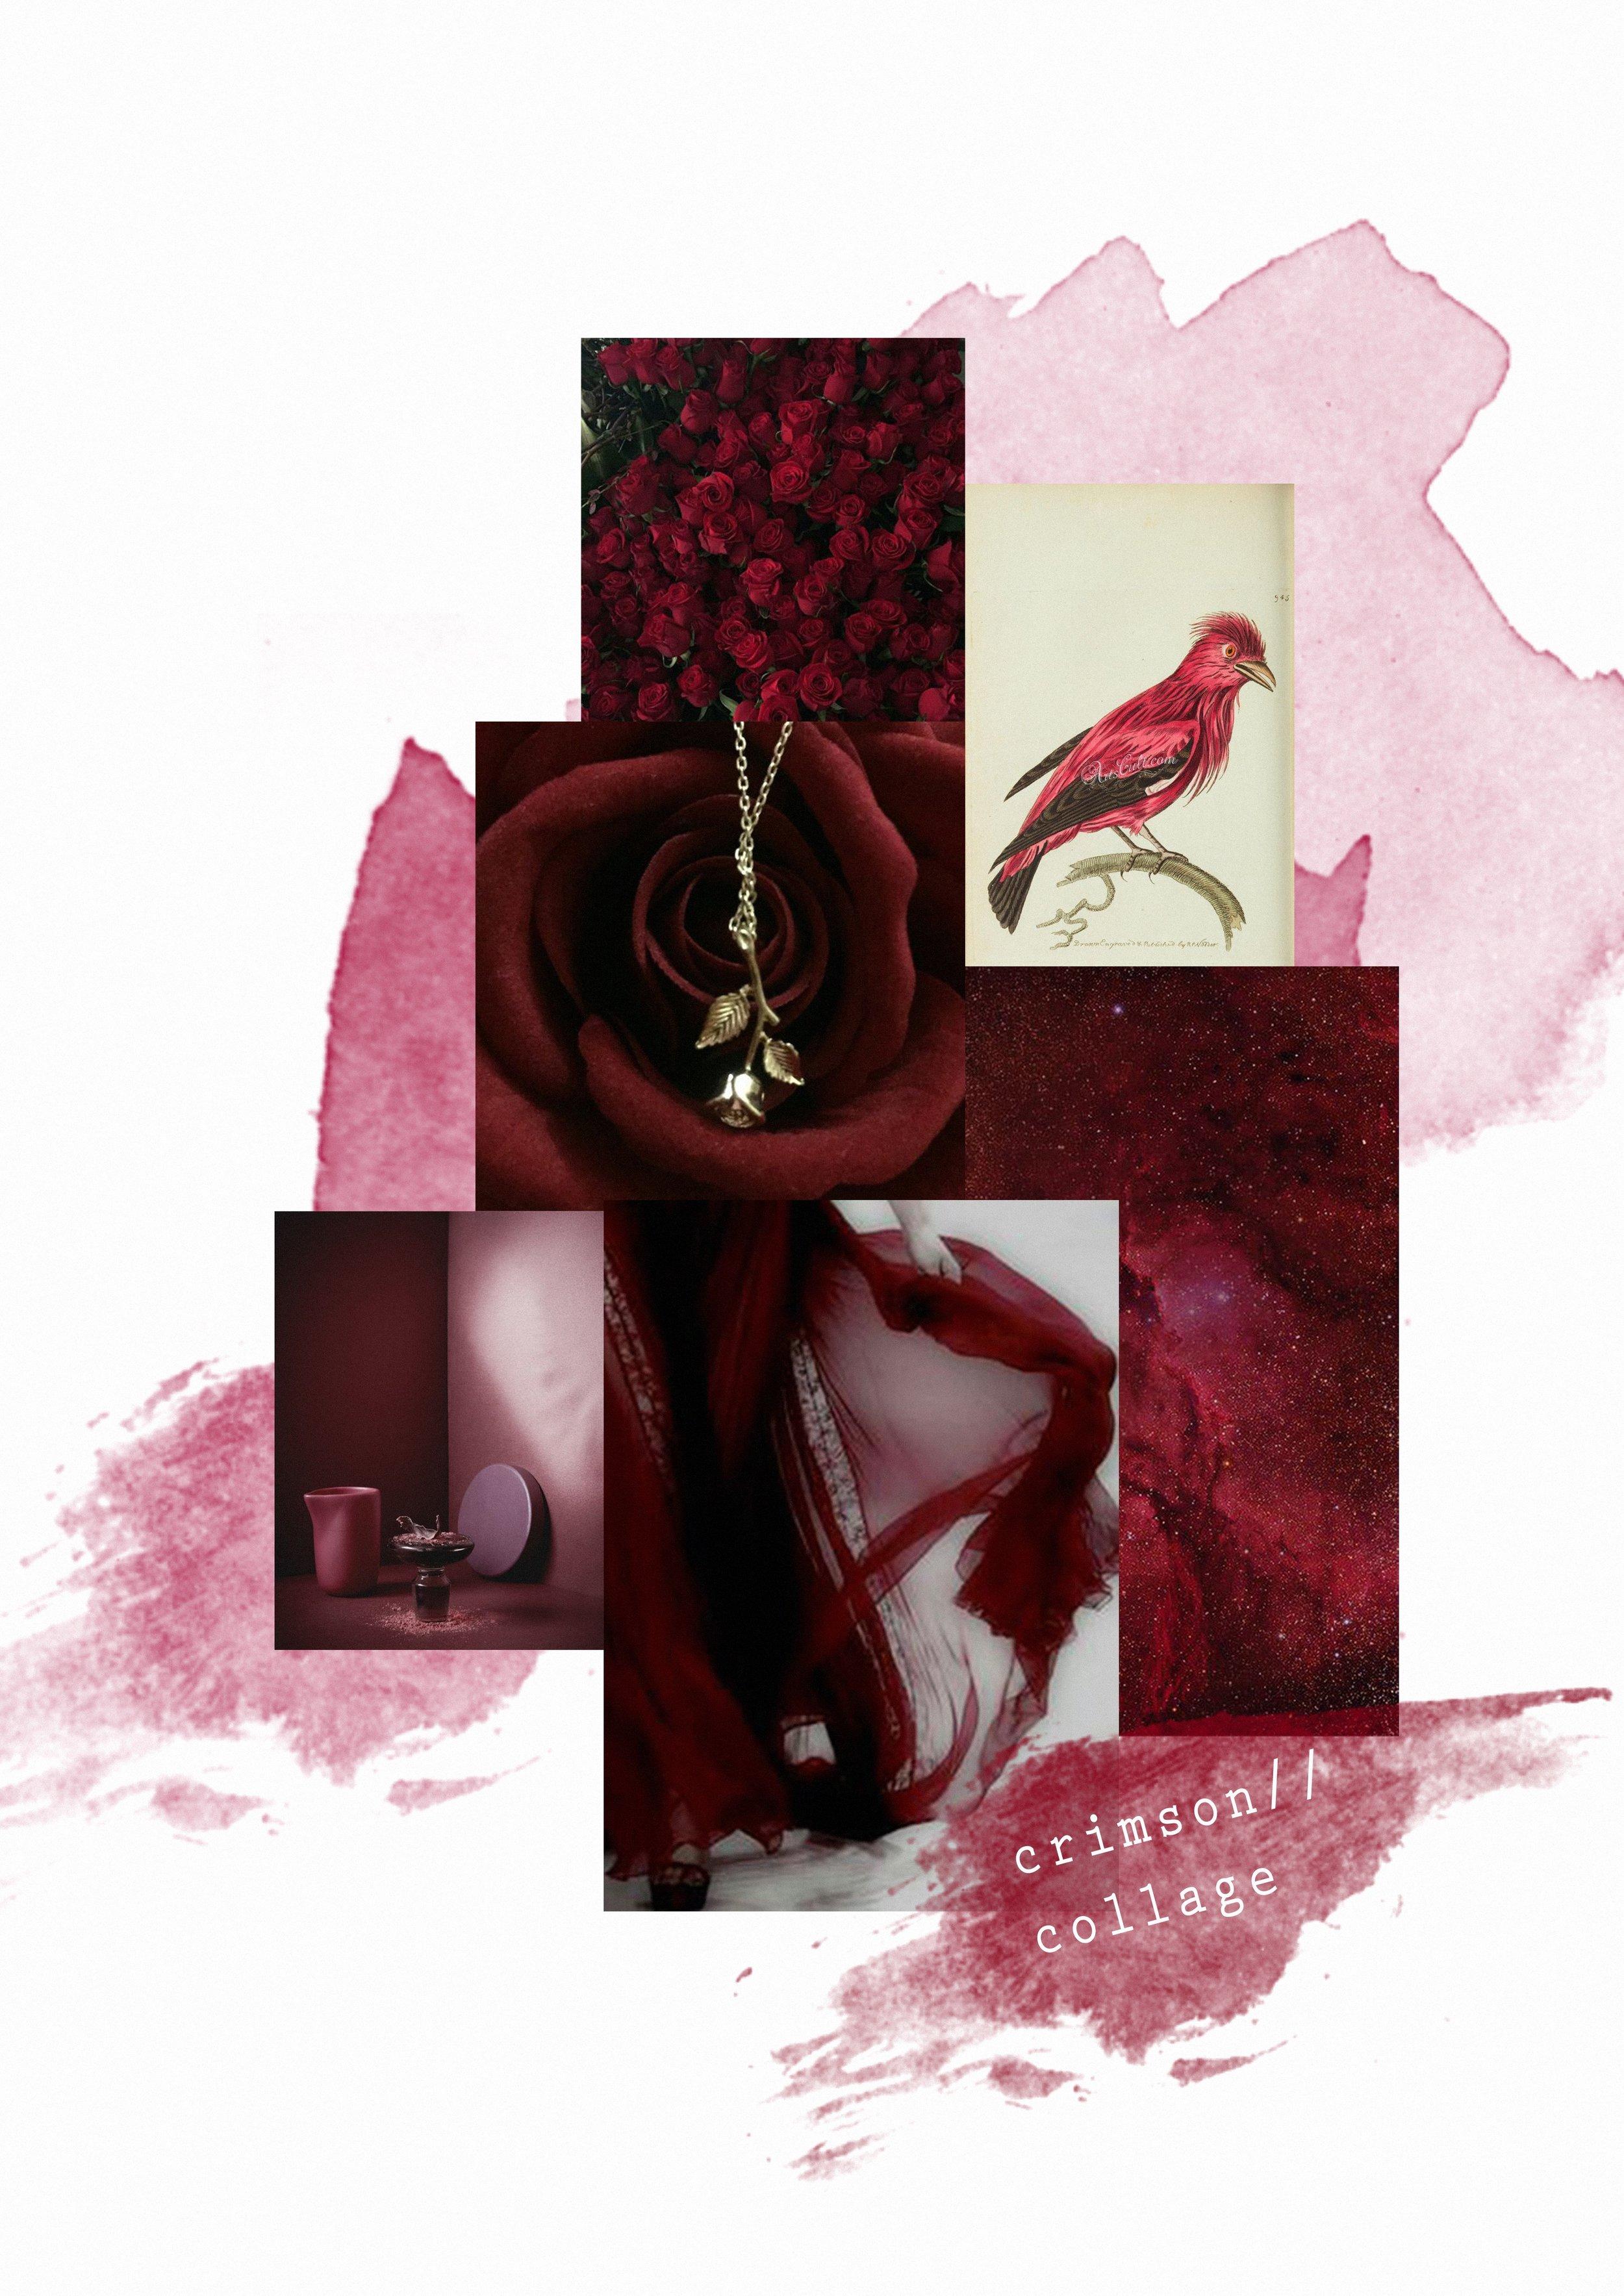 Crimson Collage.jpg